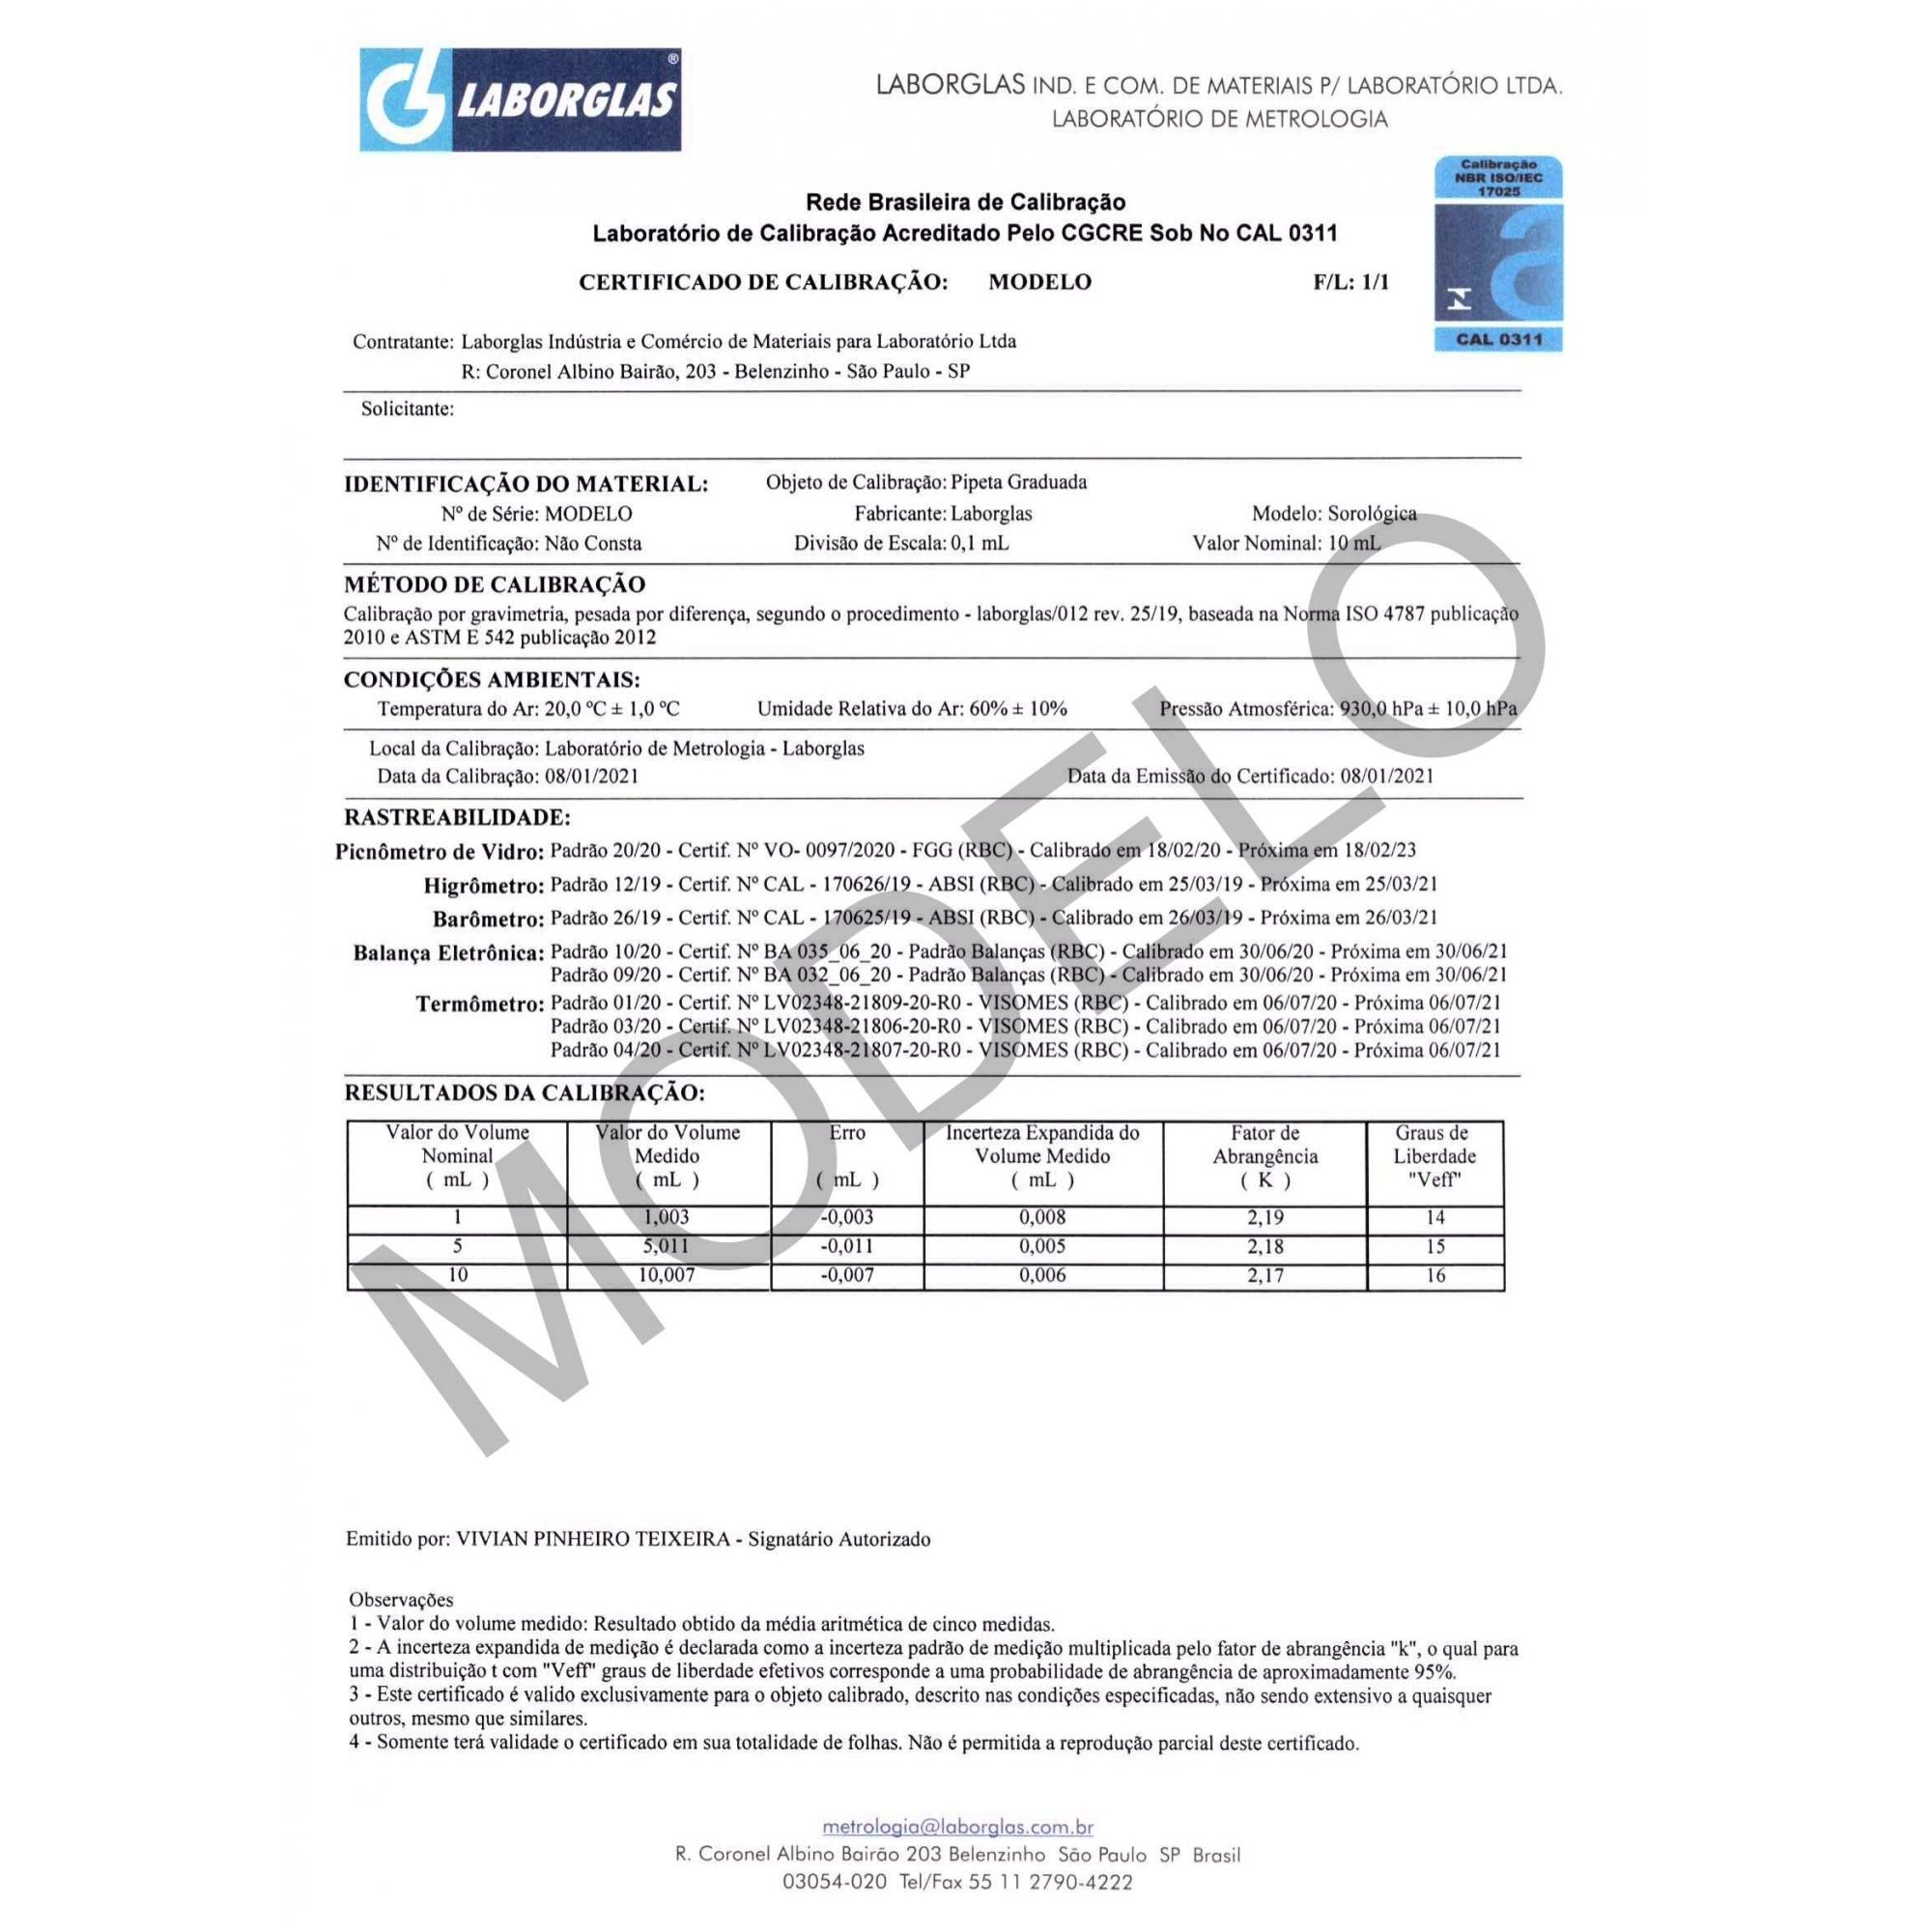 PIPETA GRAD. SOROL. ESGOT. TOTAL 0,2 ML 1/100 COM CERTIFICADO RBC - Laborglas - Cód. 9434303-R